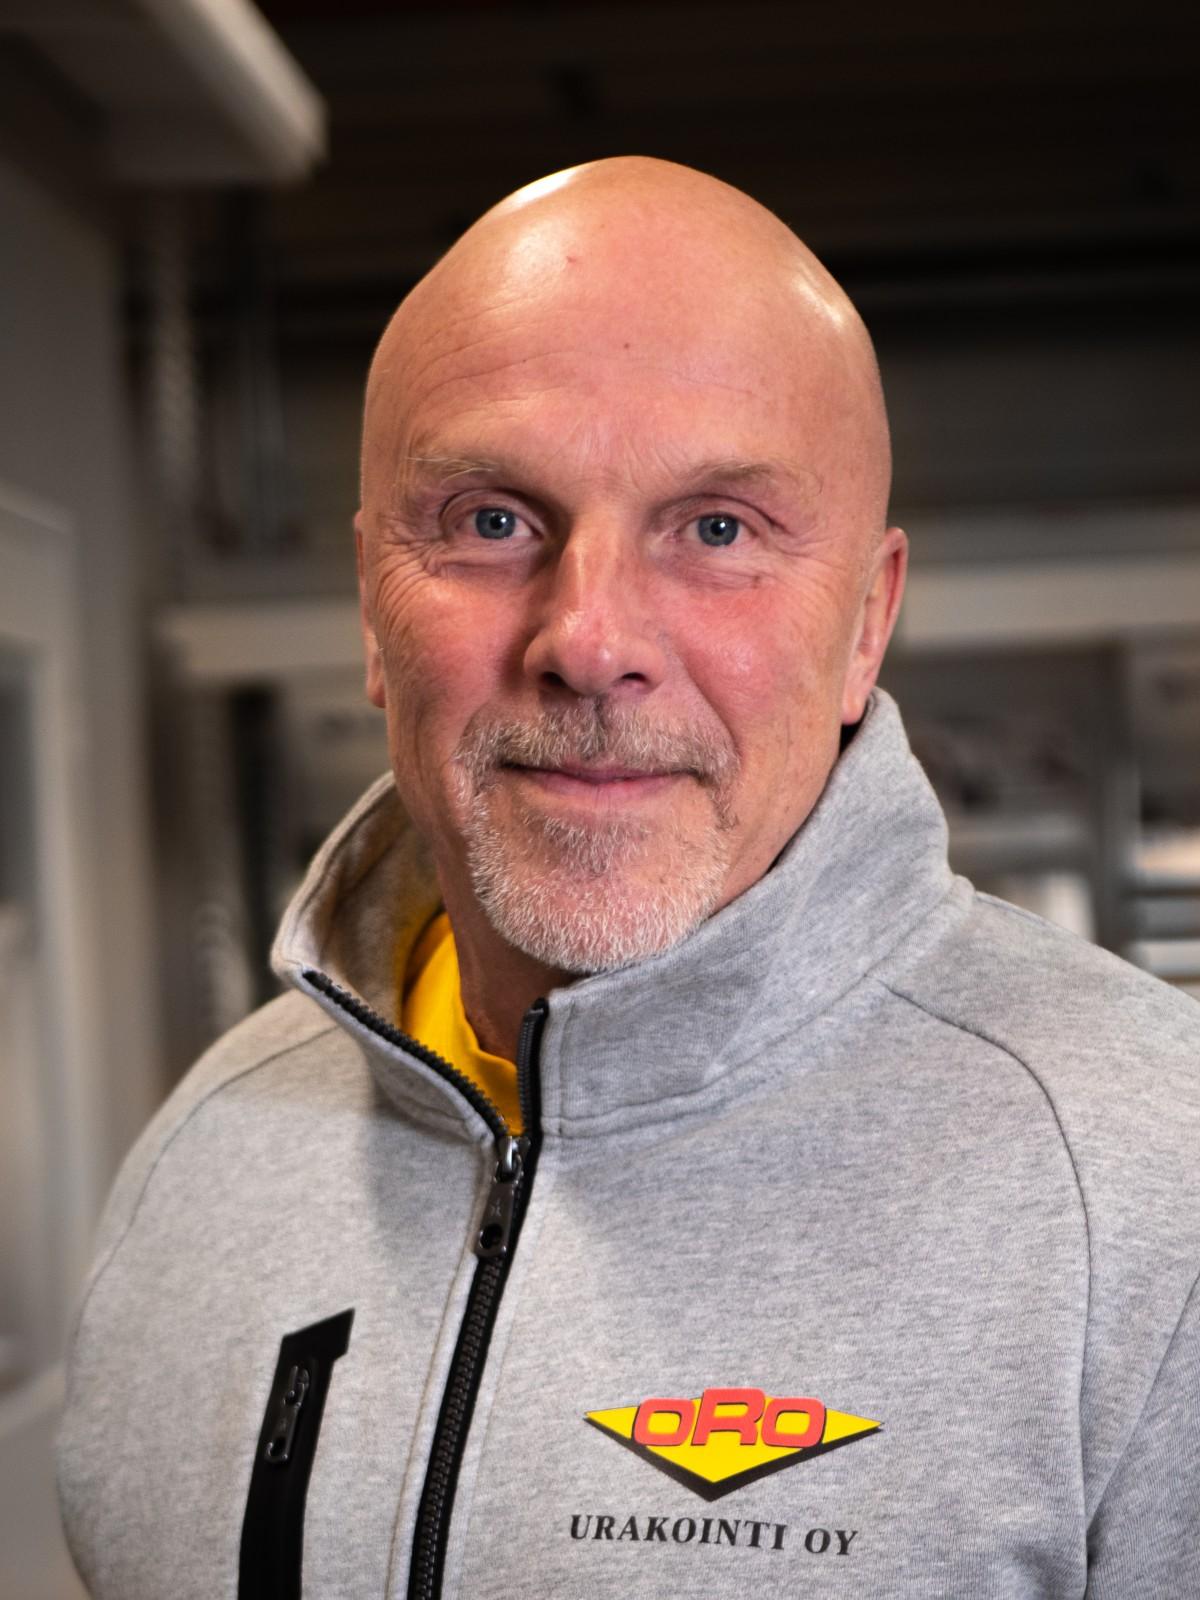 Vesa-Pekka Moilanen, Toimitusjohtaja